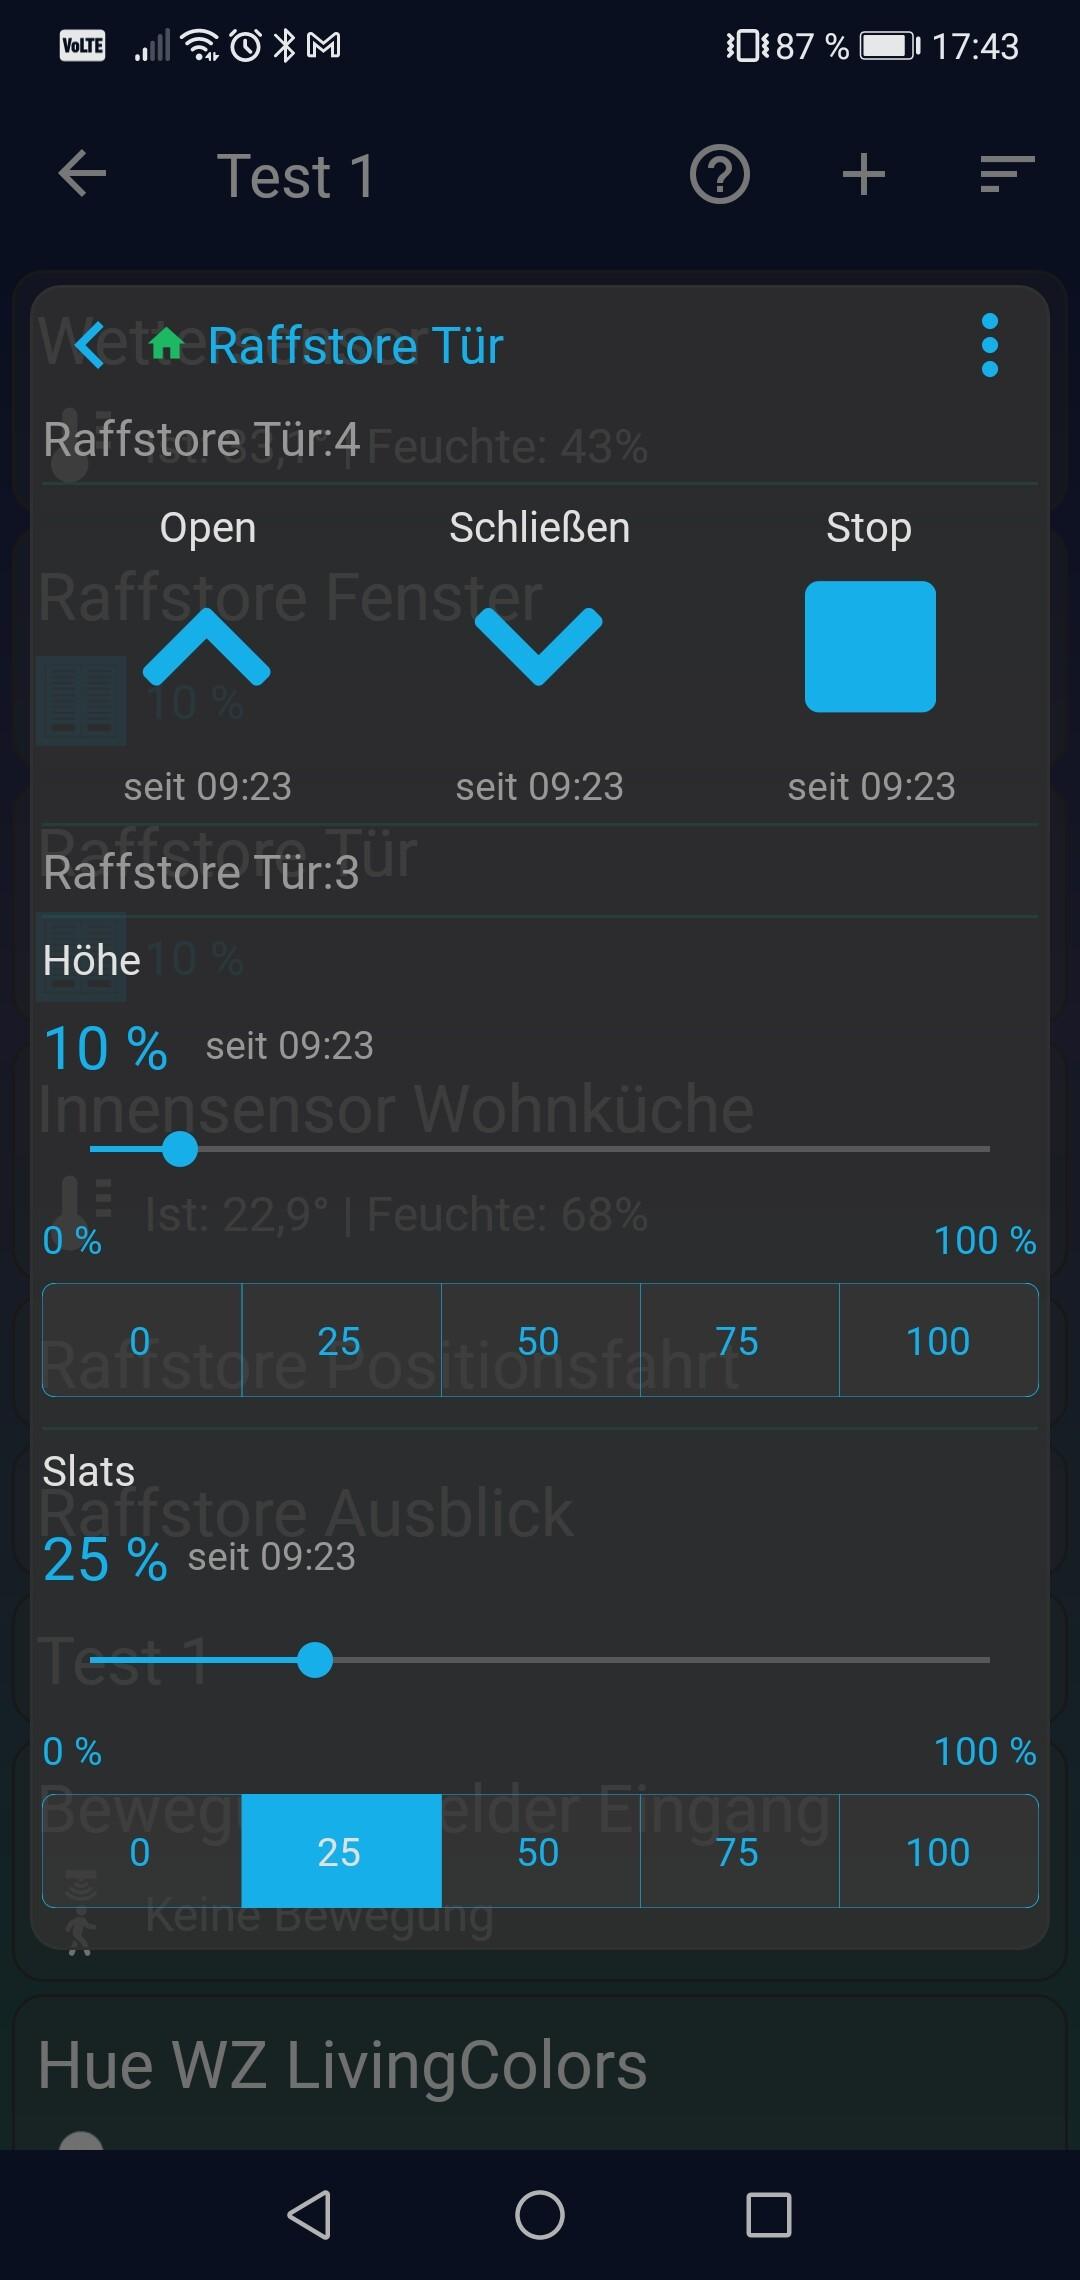 Screenshot_20210707_174334_com.easysmarthome.cloudmaticapp